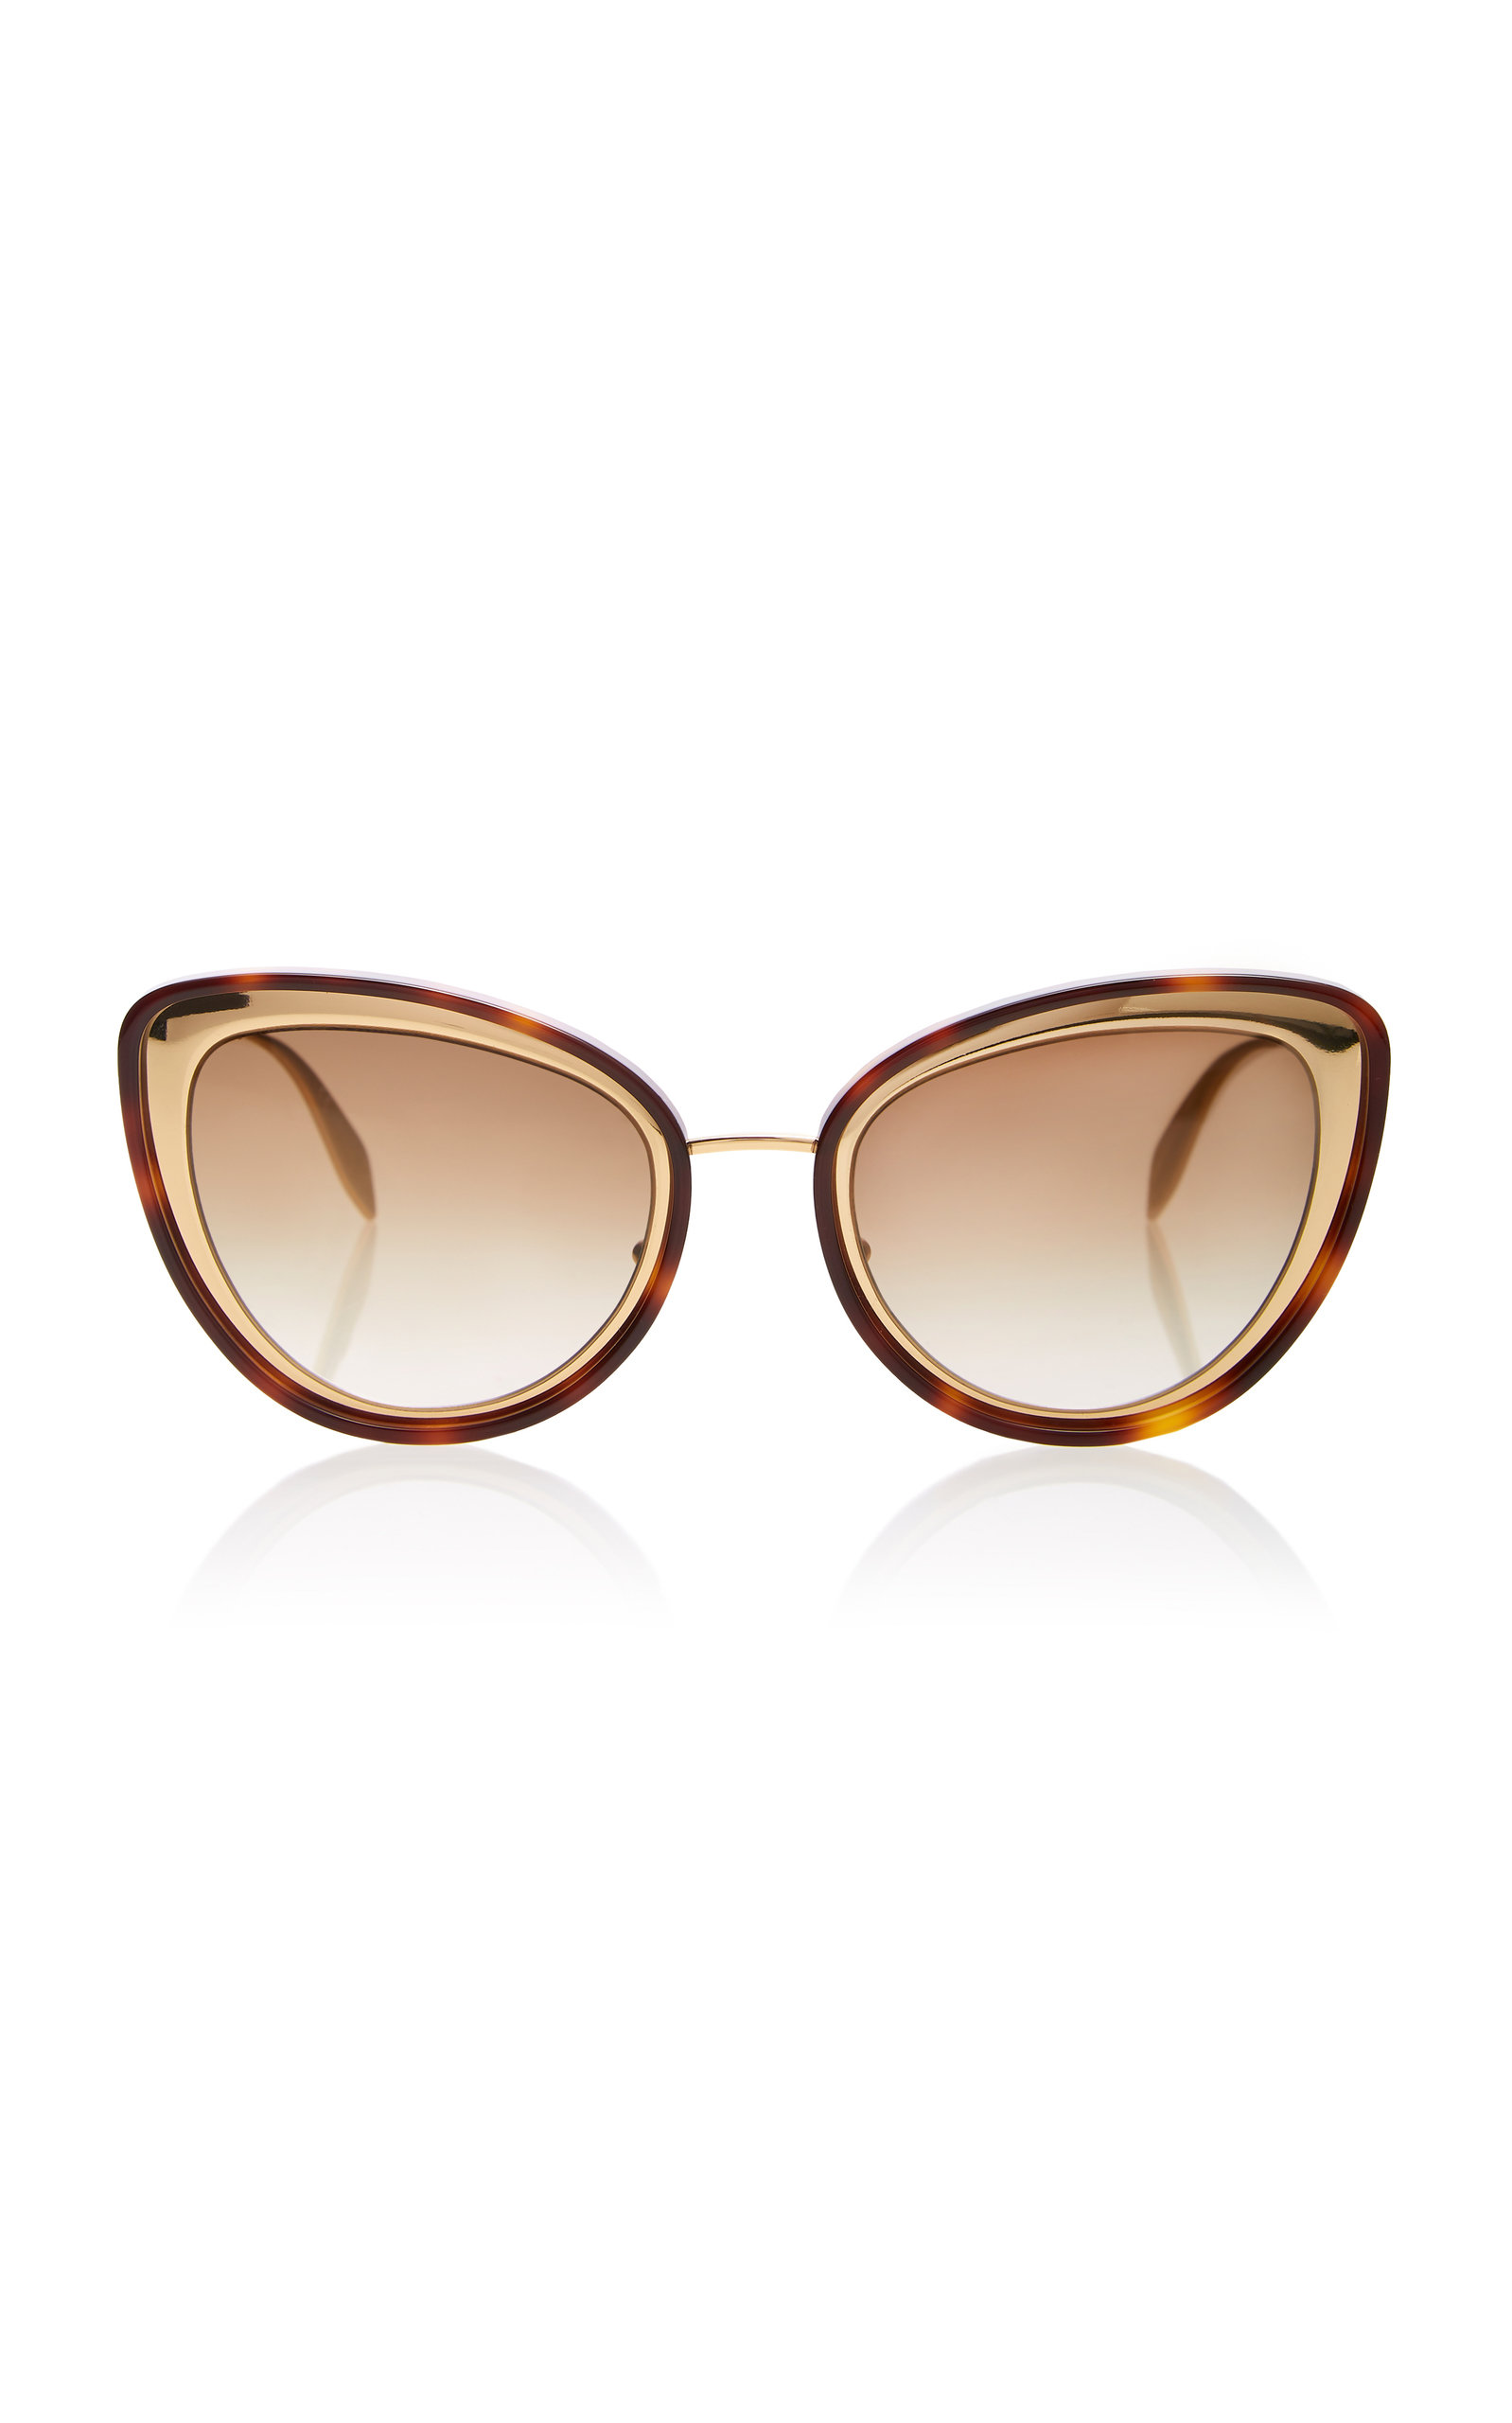 291b666303d12 Tortoises Acetate Cat Eye Sunglasses By Alexander Mcqueen